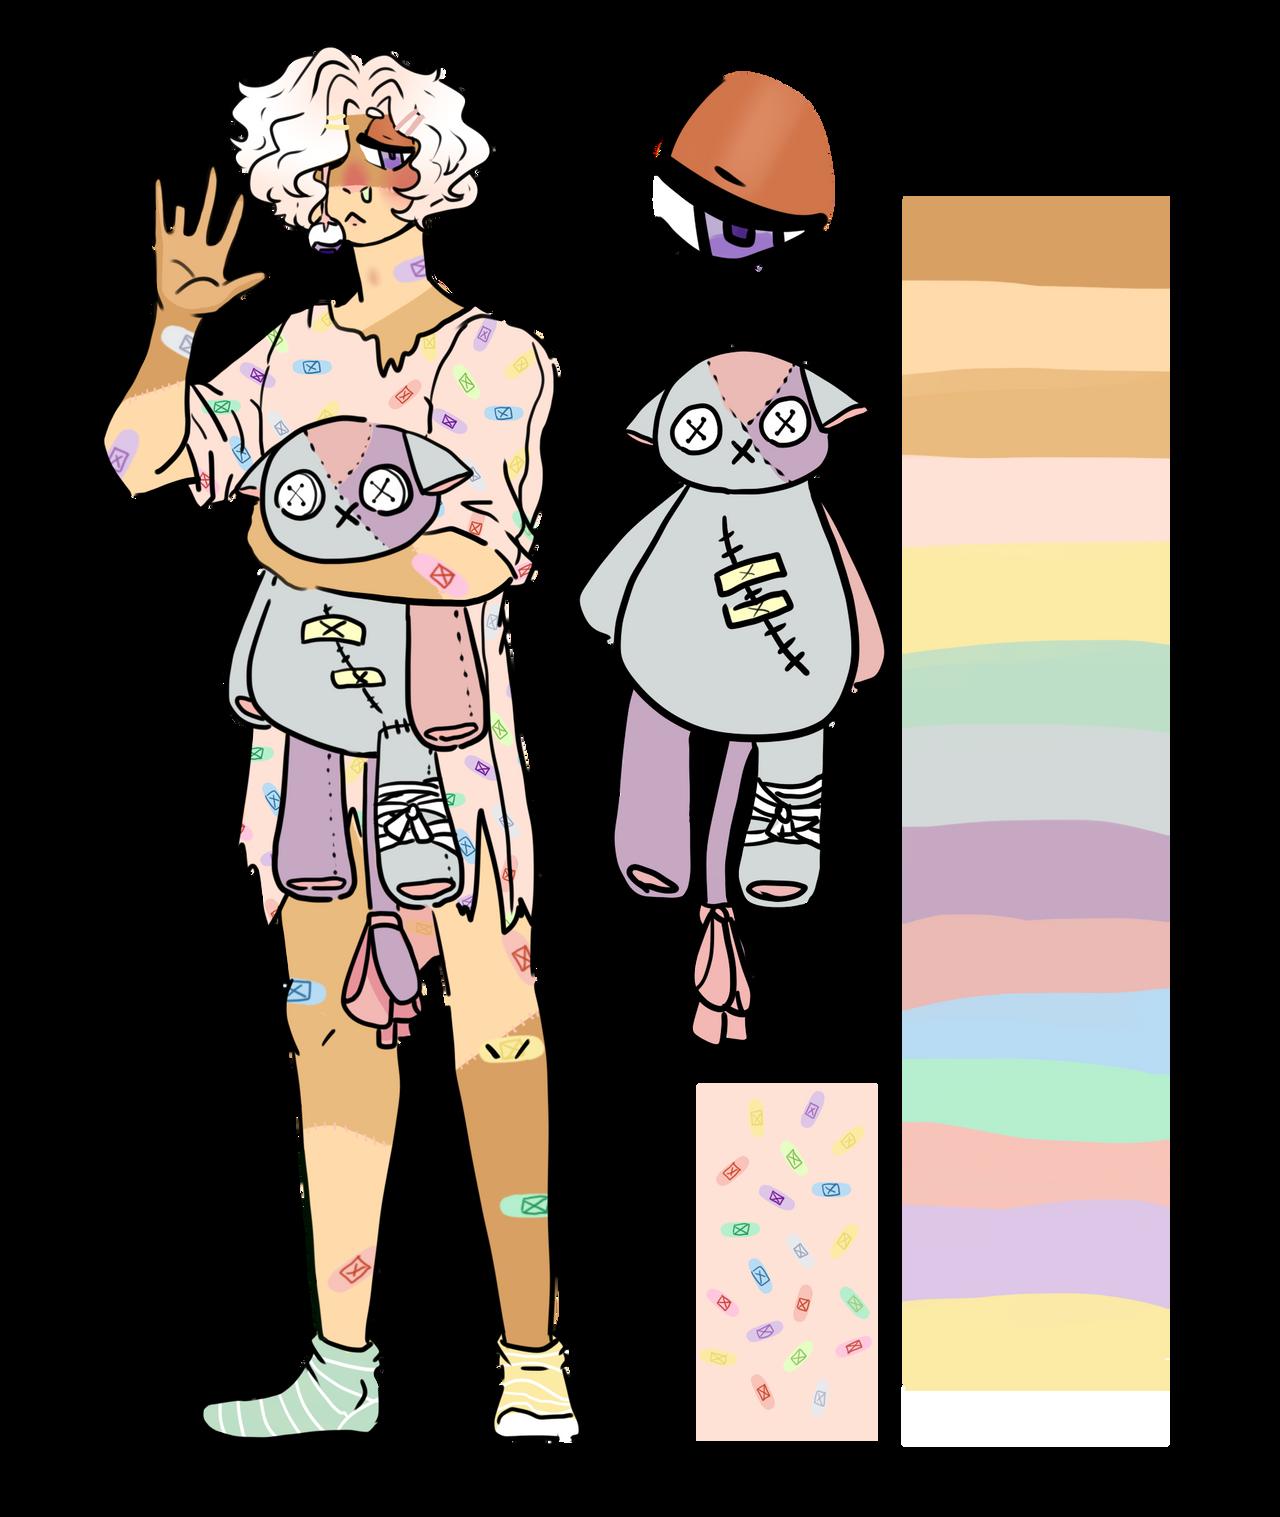 Sick boy (design trade) by RatKnife